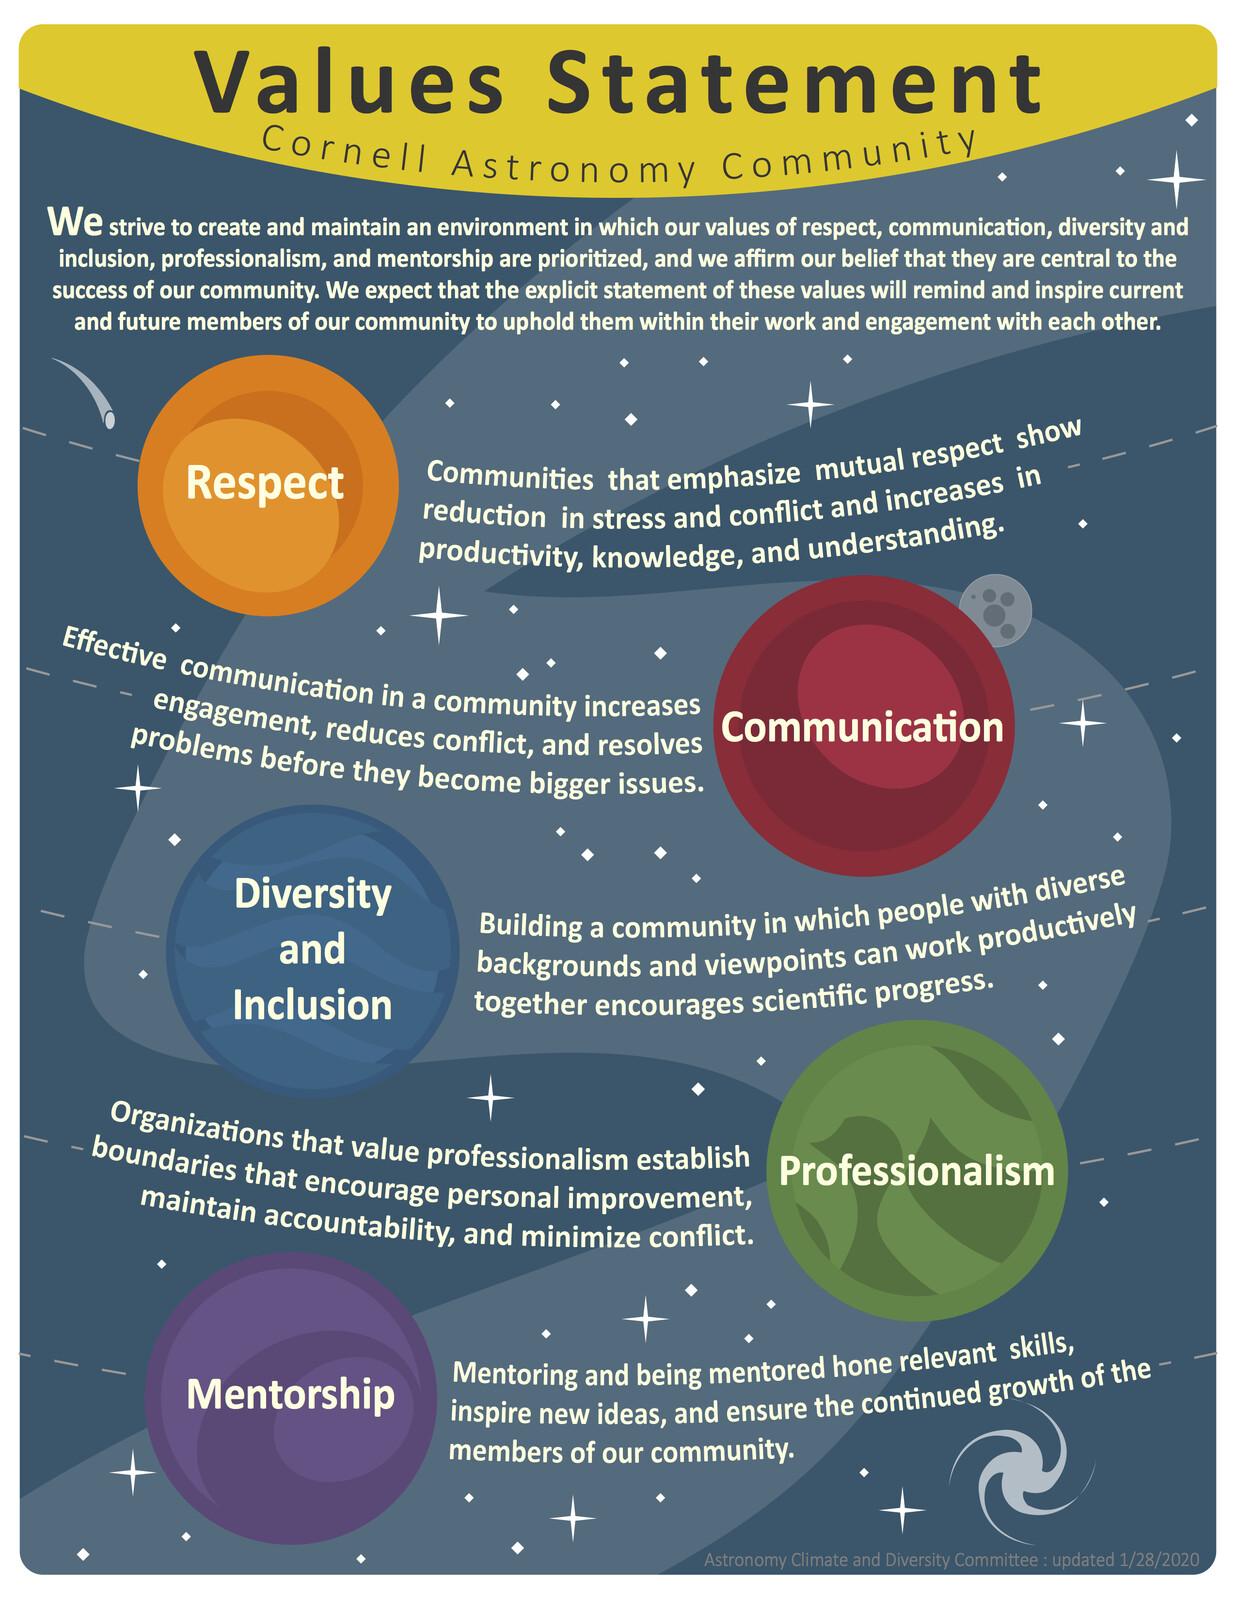 Cornell Astronomy Values Statement